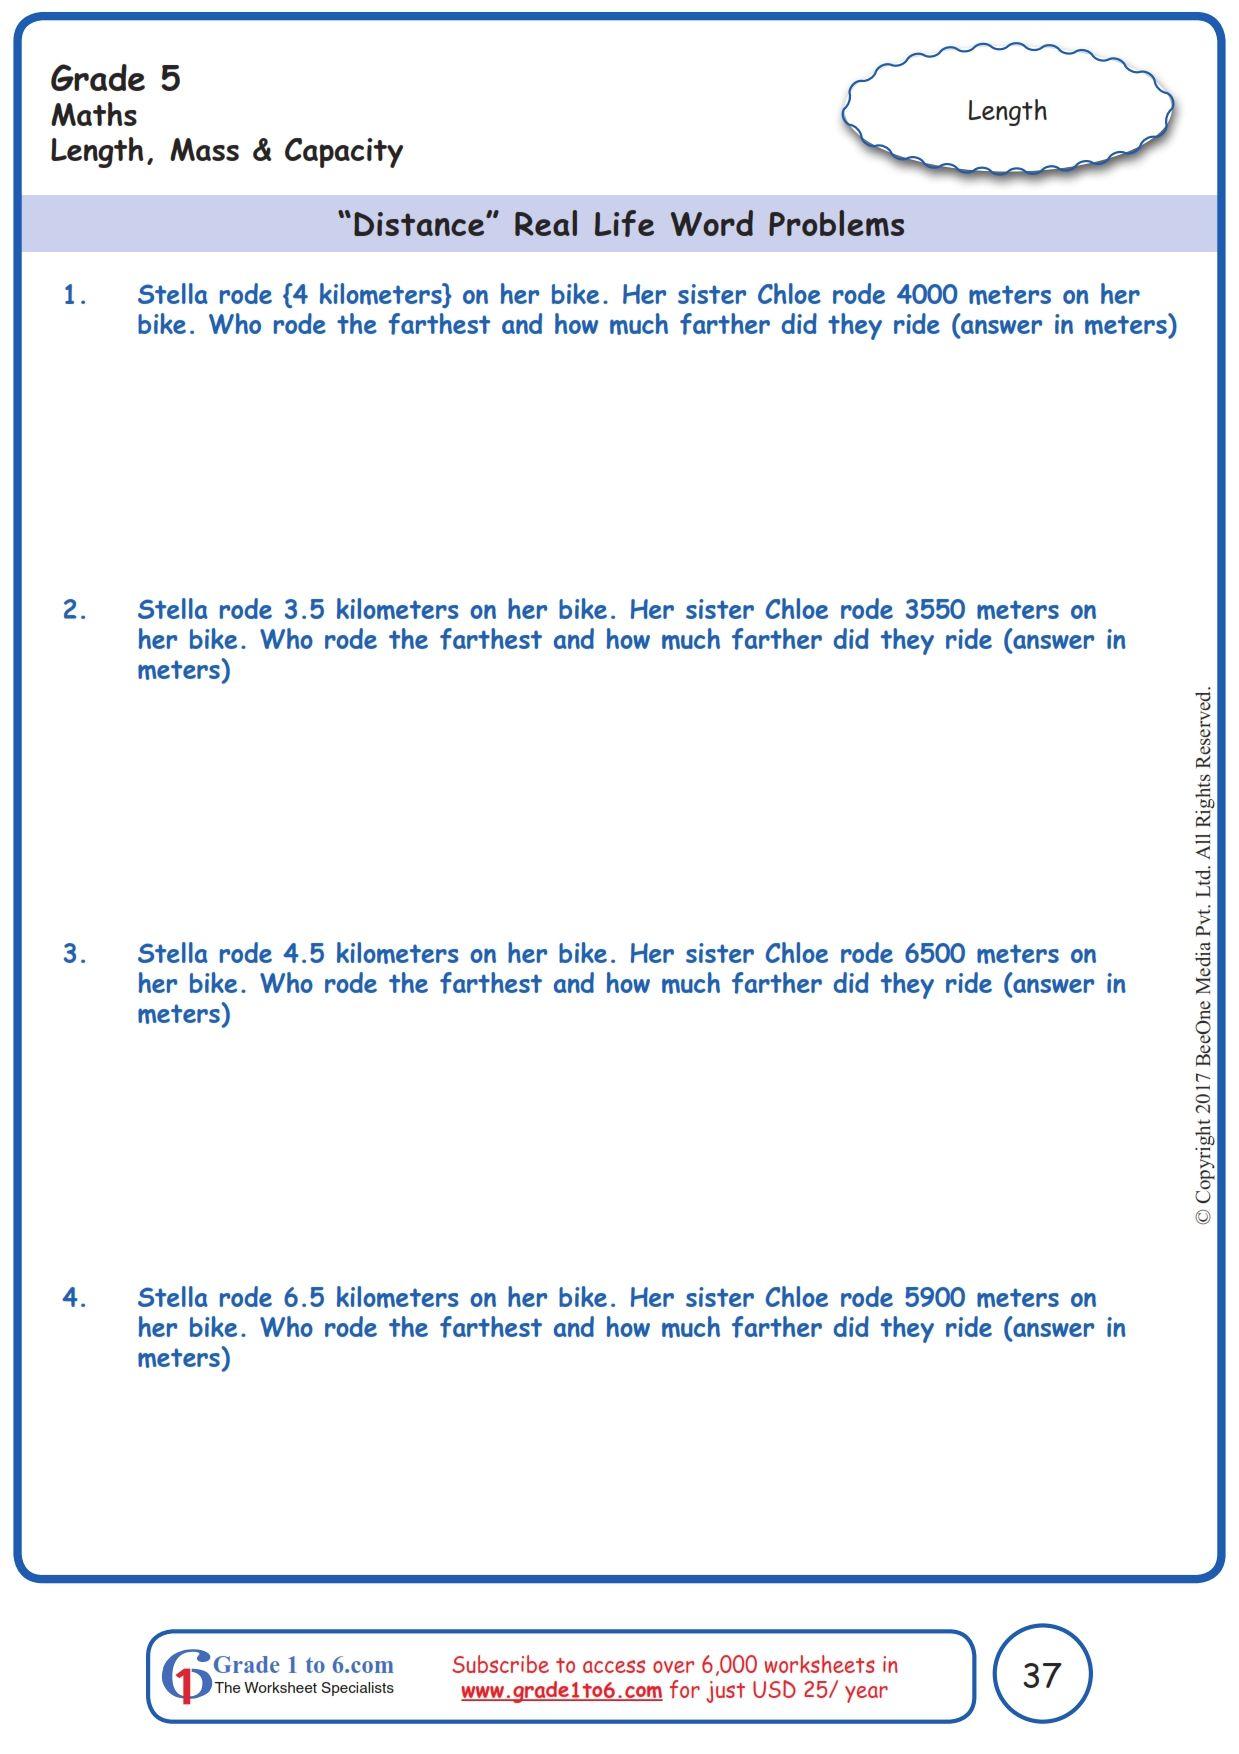 Worksheet Grade 5 Math Distance Real Life Word Problems Word Problems Free Math Worksheets Measurement Word Problems Math grade worksheets word problems